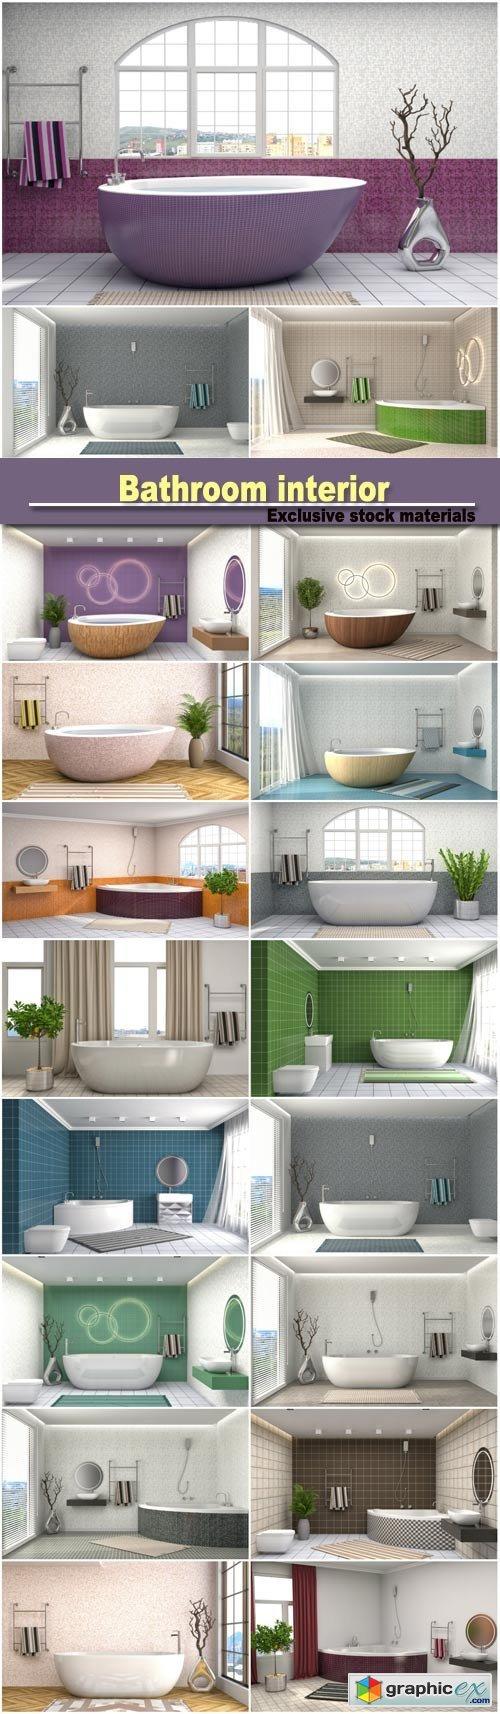 Bathroom interior 3D illustration  stock images